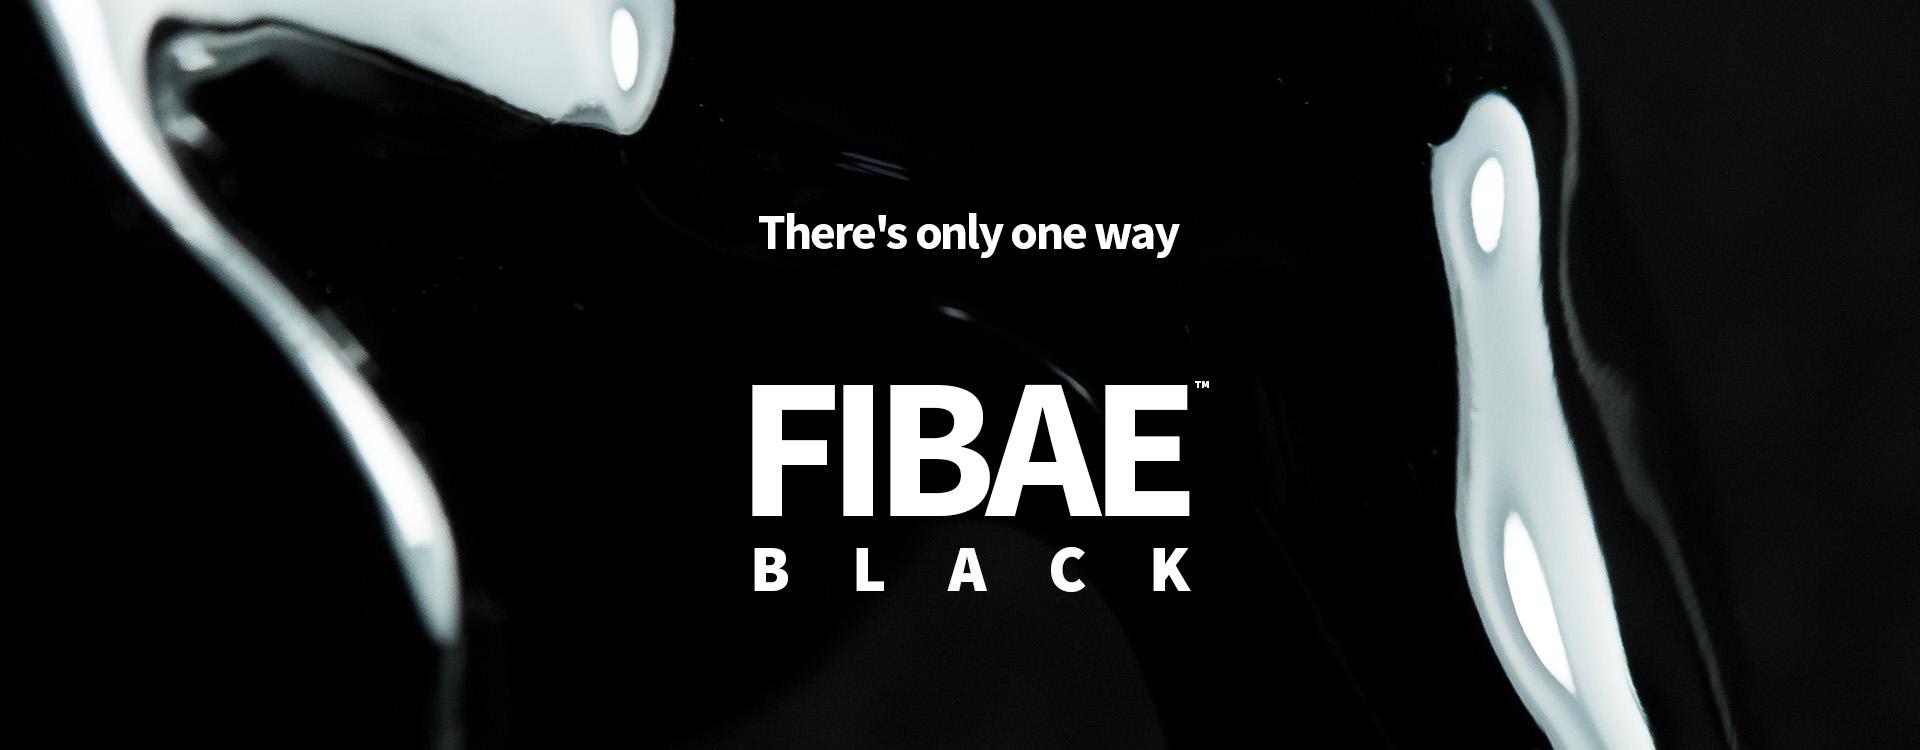 FIBAE Black